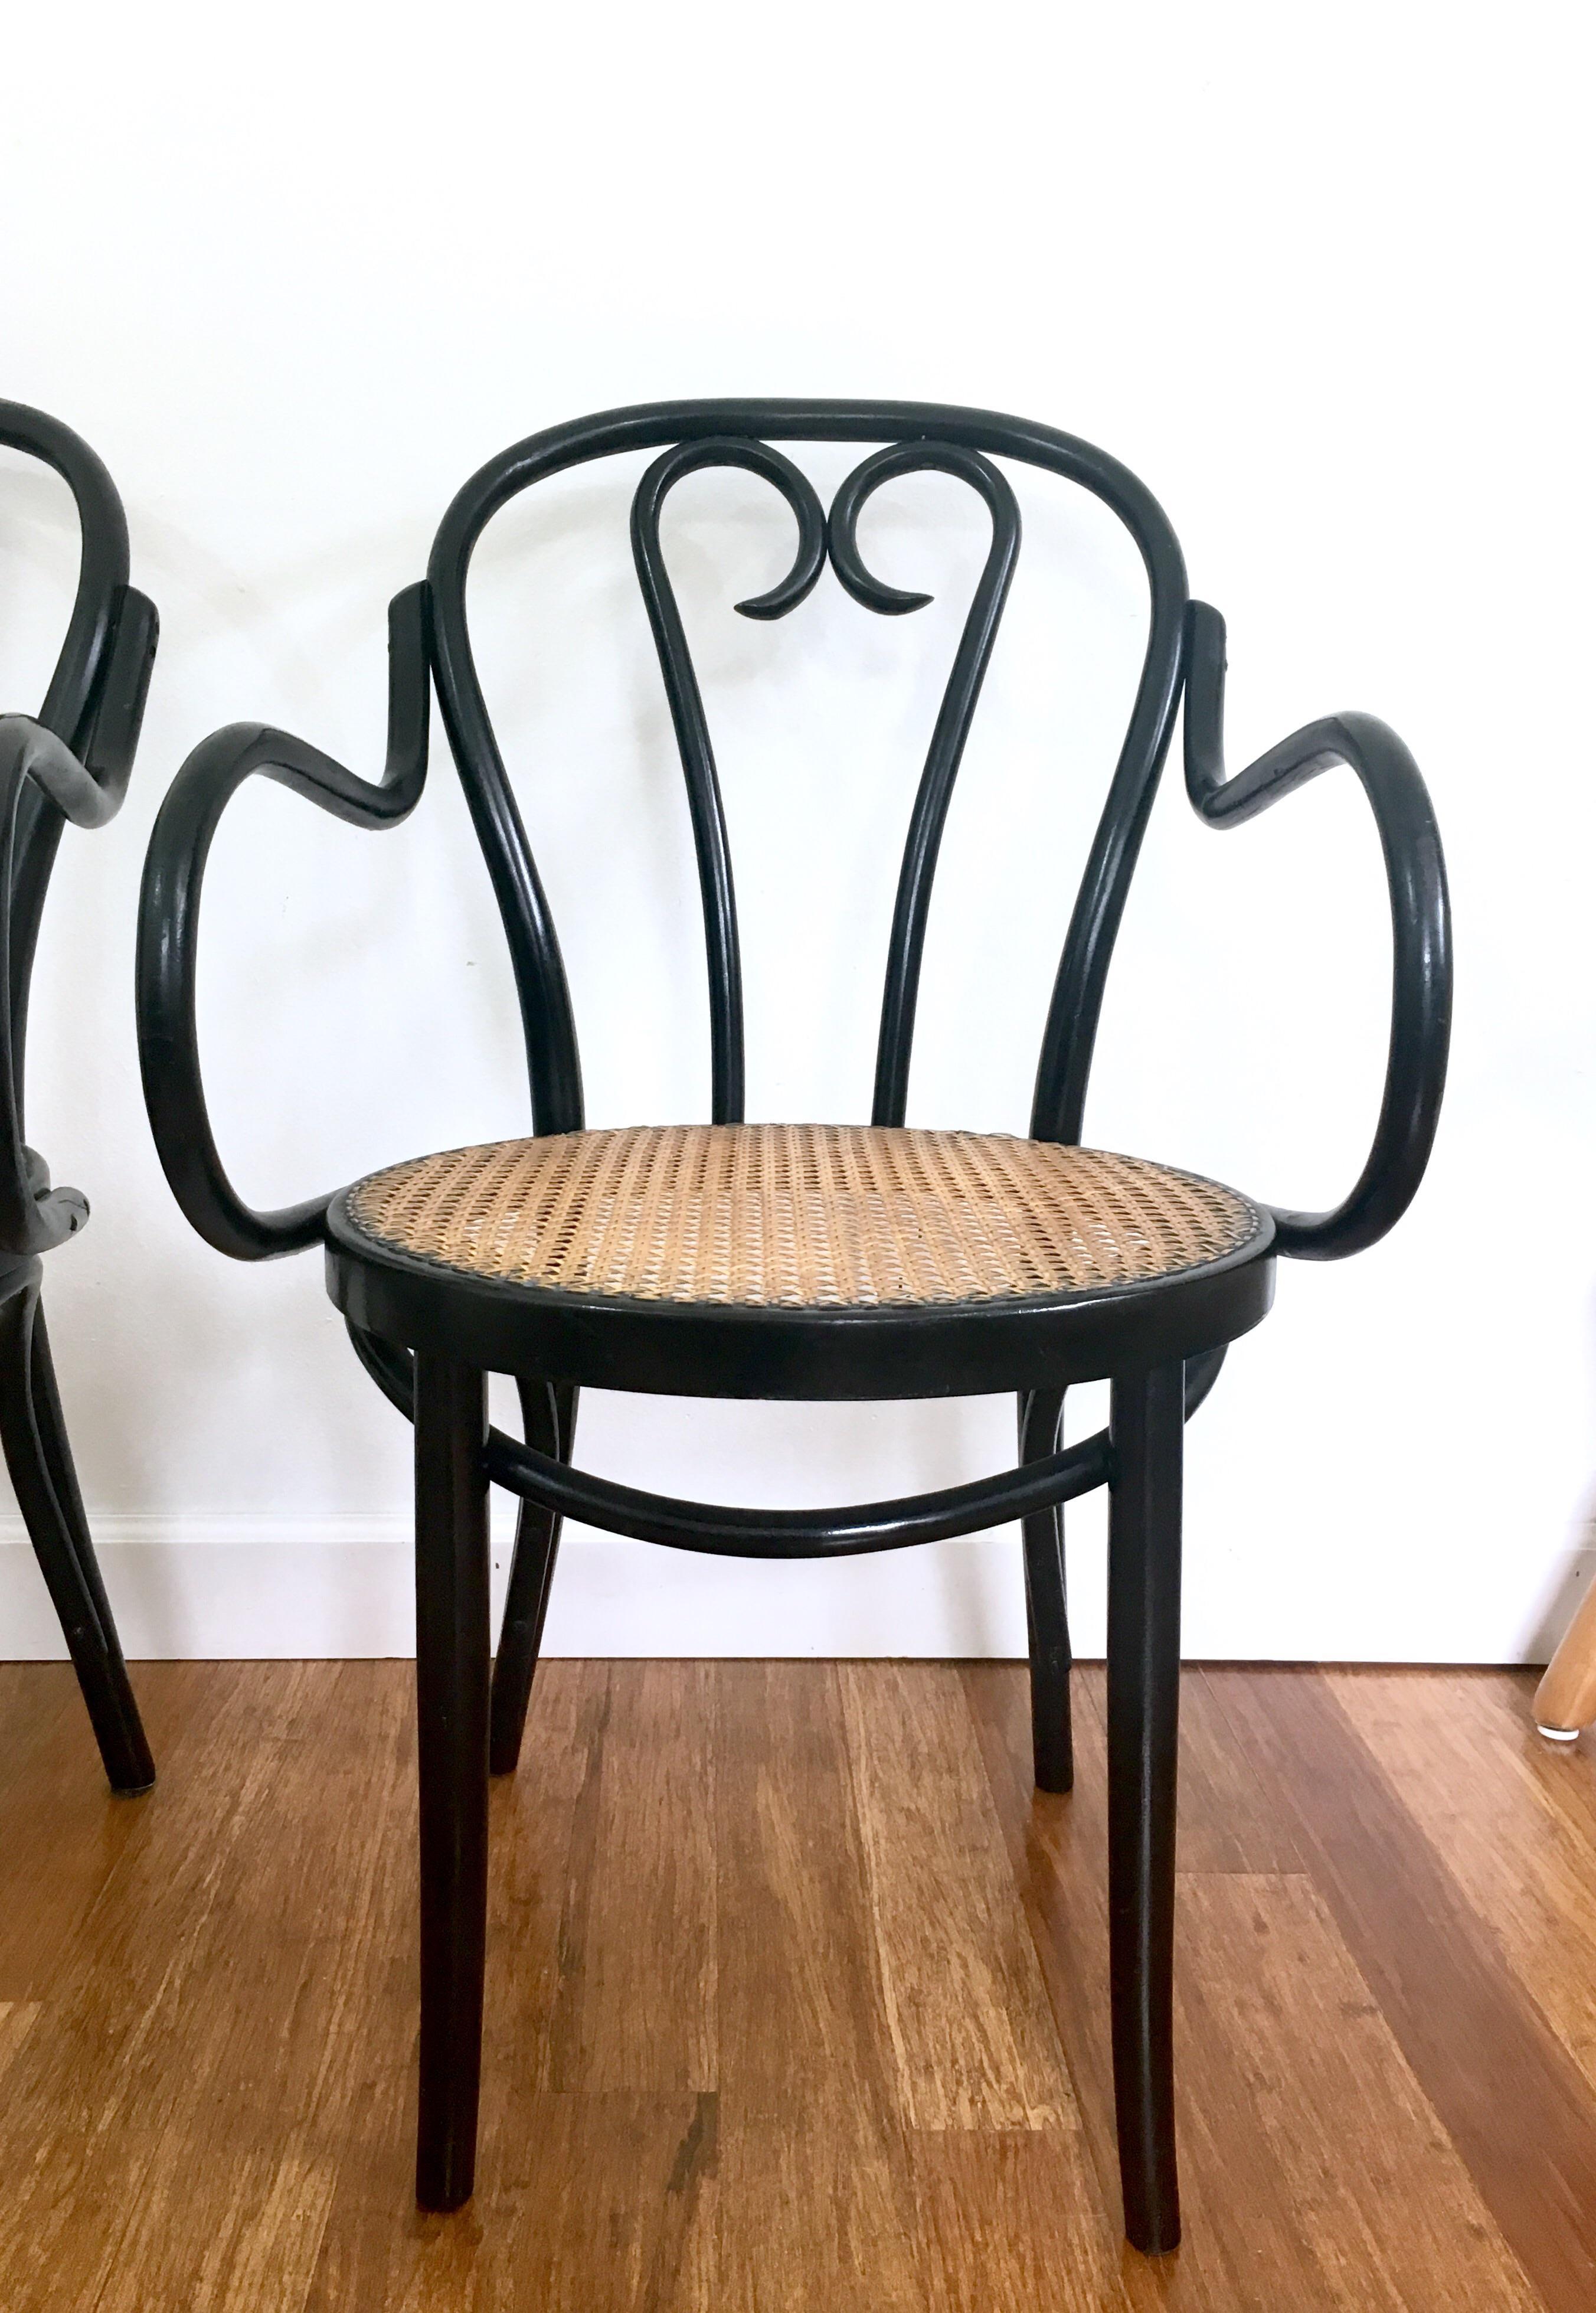 Elegant Bentwood Black U0026 Cane Chairs   A Pair   Image 4 Of 10